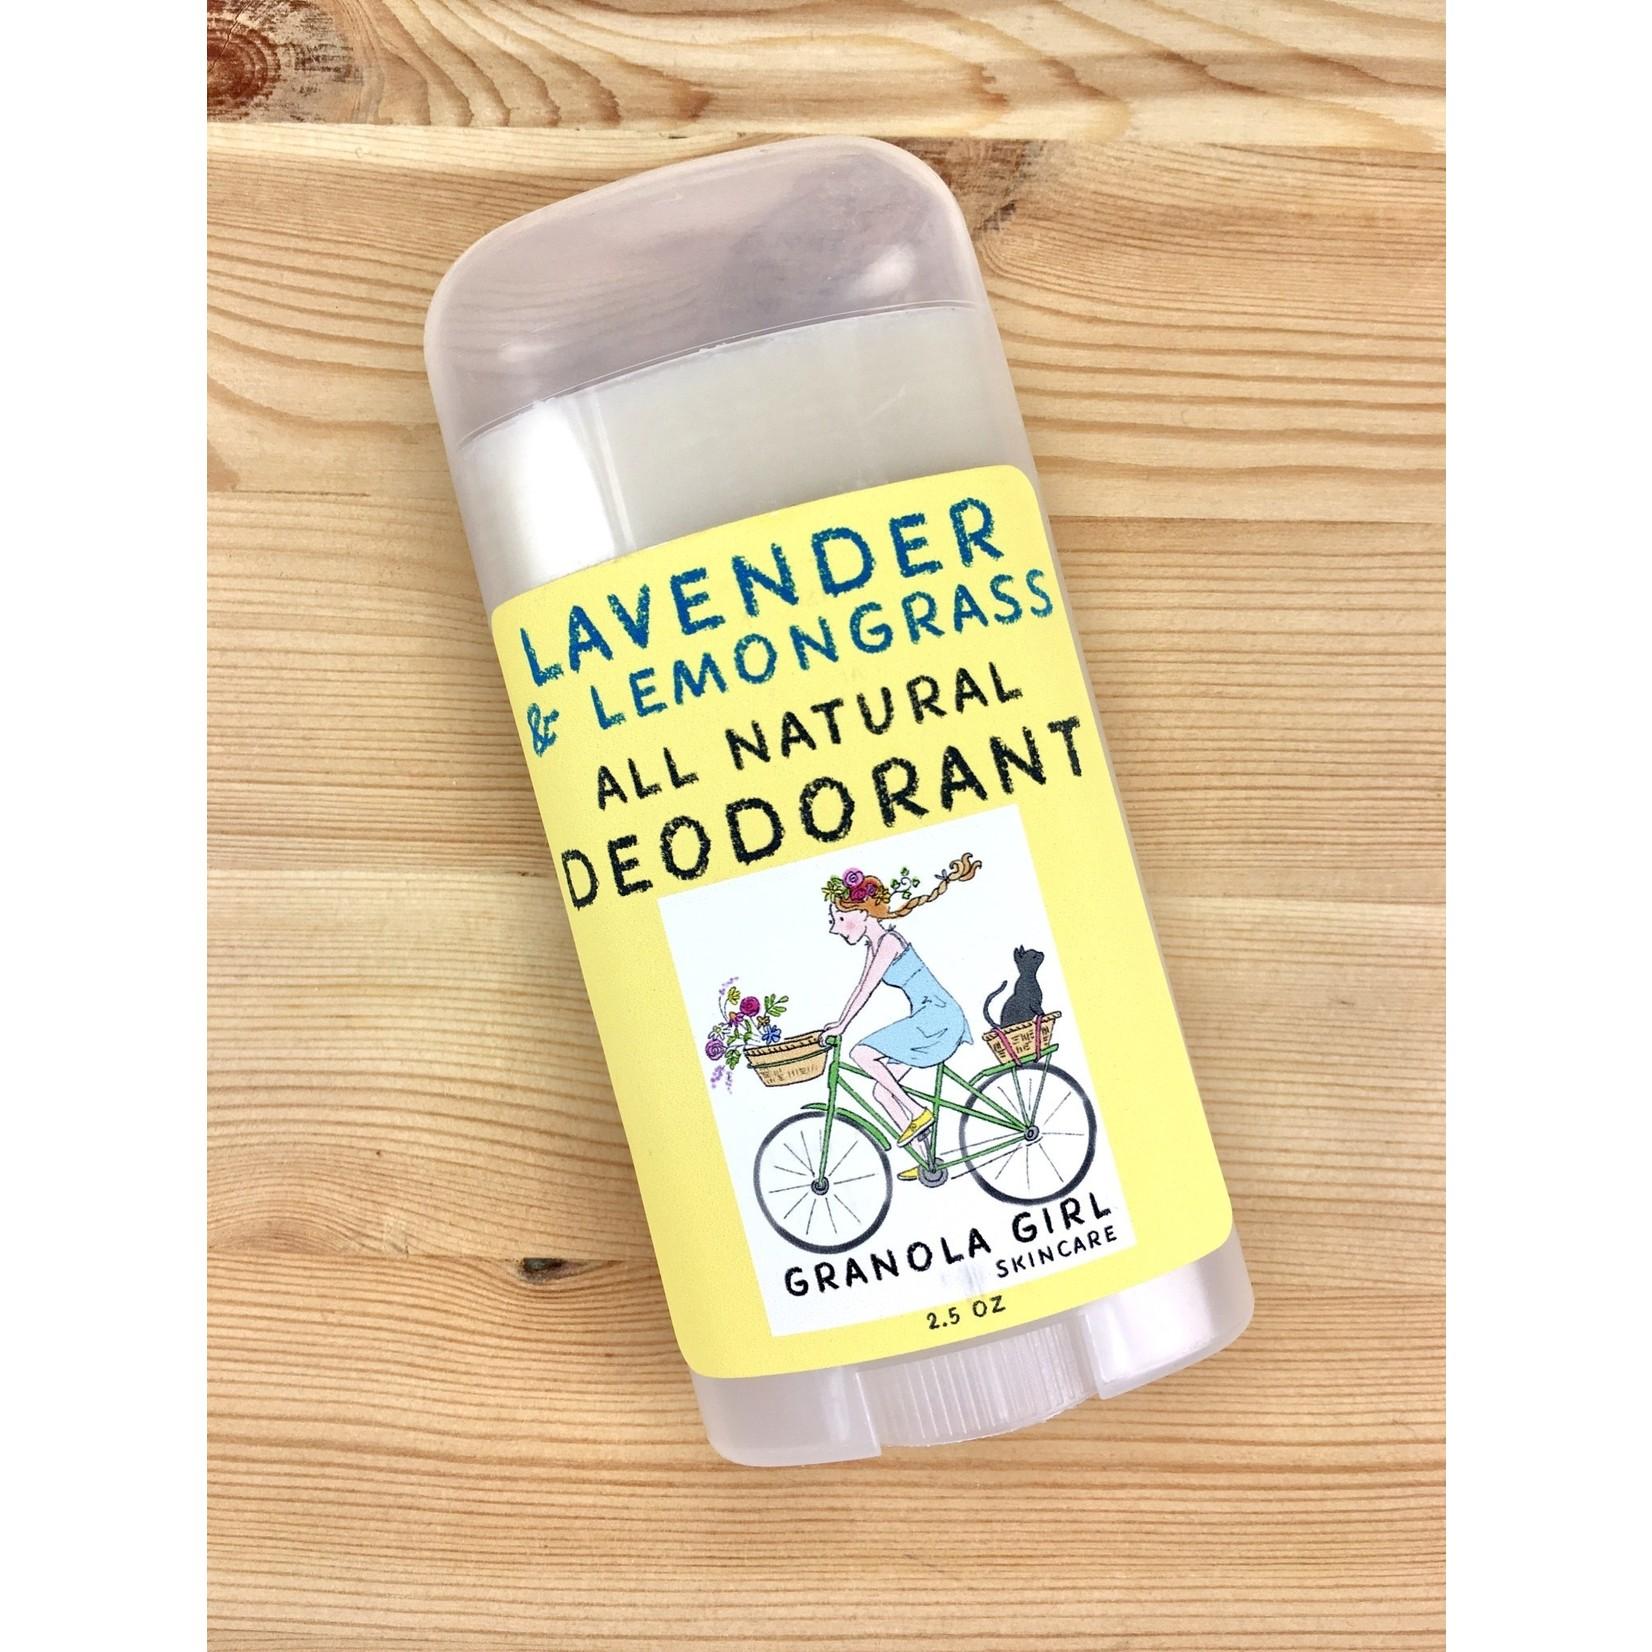 Granola Girl Skincare /Teehaus Bath + Body (QO) Granola Girl All-Natural Deodorant